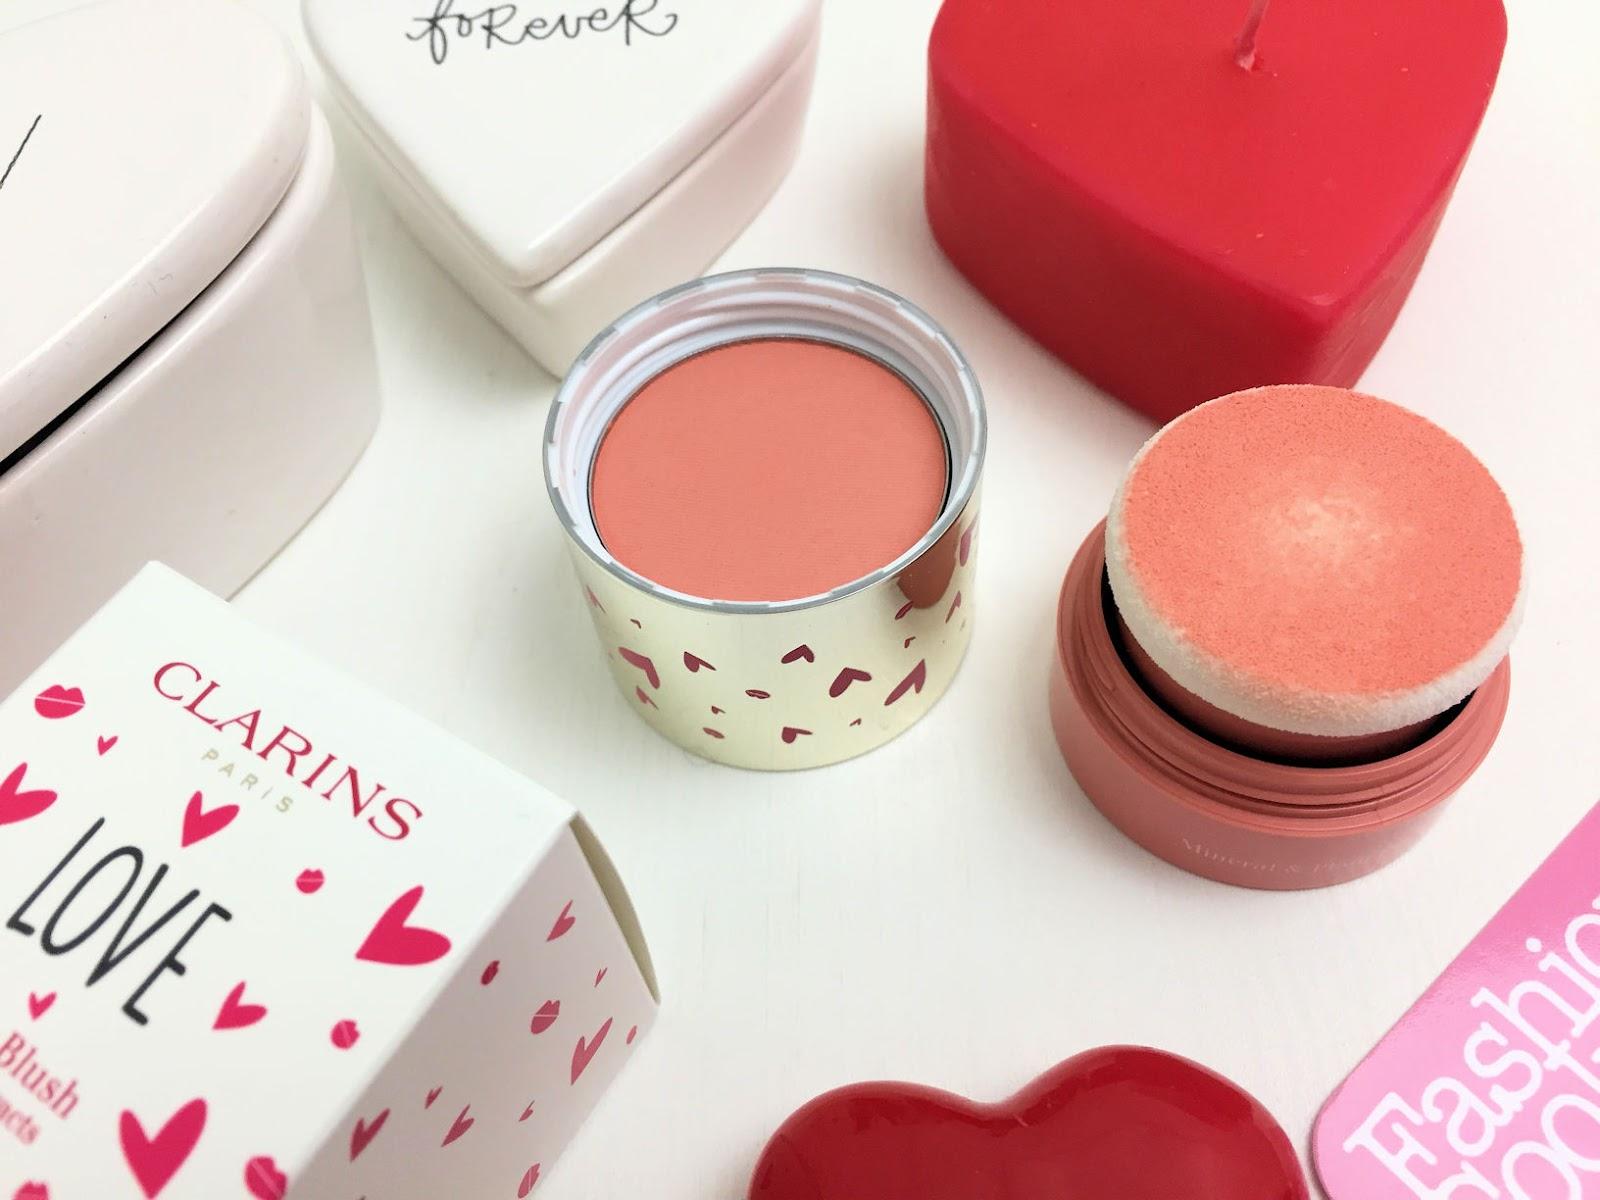 makeup di San Valentino con la capsule collection Clarins: Skin Illusion Blush luminous coral su Fashion and Cookies beauty blog, beauty blogger